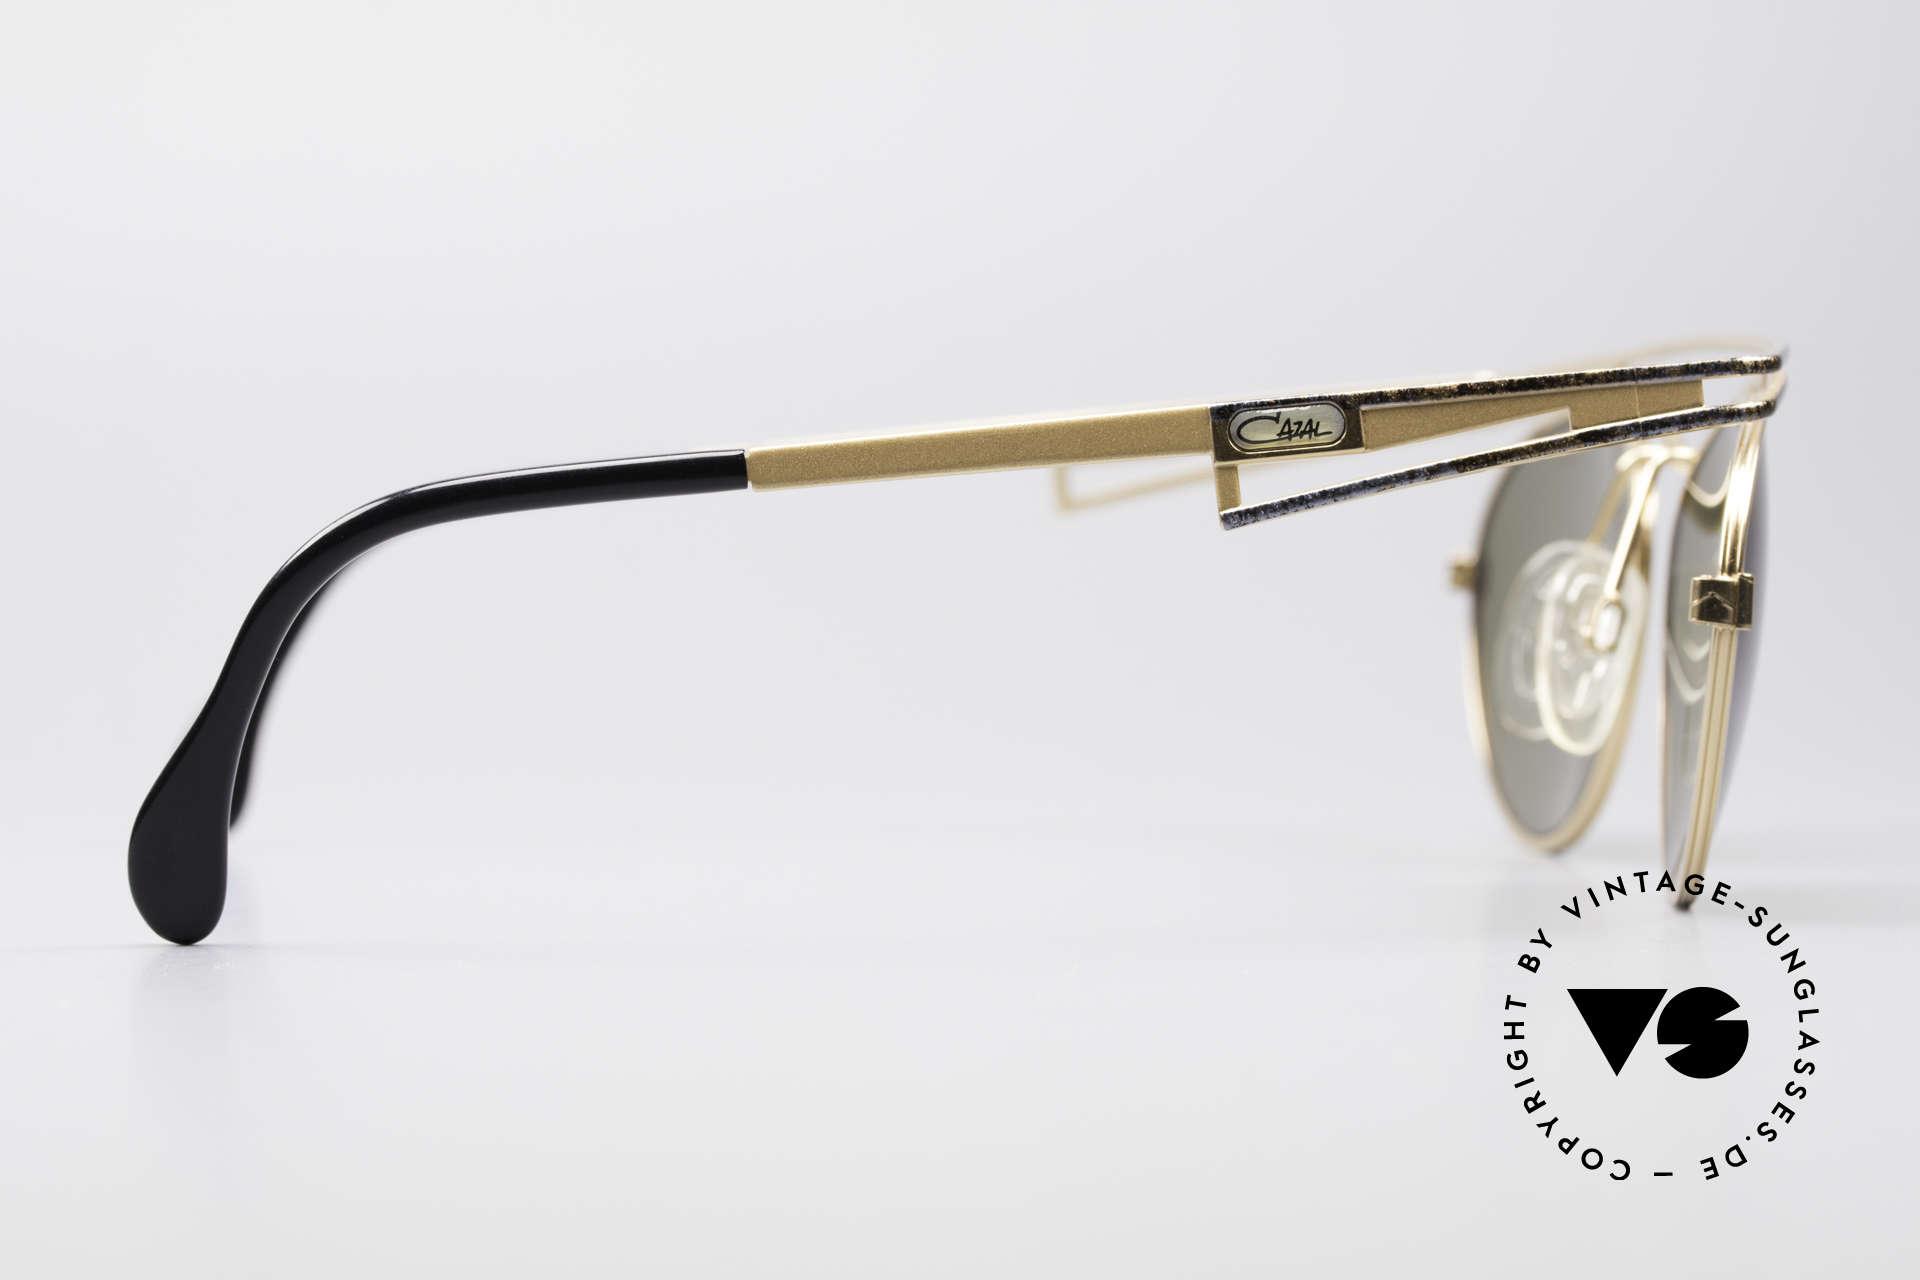 Cazal 970 Extraordinary Shades Women, with original Cazal sun lenses for 100% UV protection, Made for Women